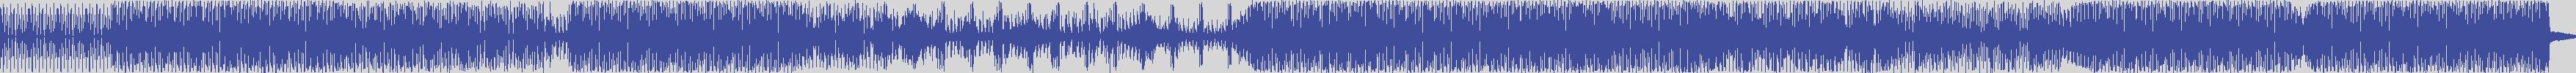 bunny_clan [BYC048] Max Esposito - Jack 1976 [LatinJack Mix] audio wave form